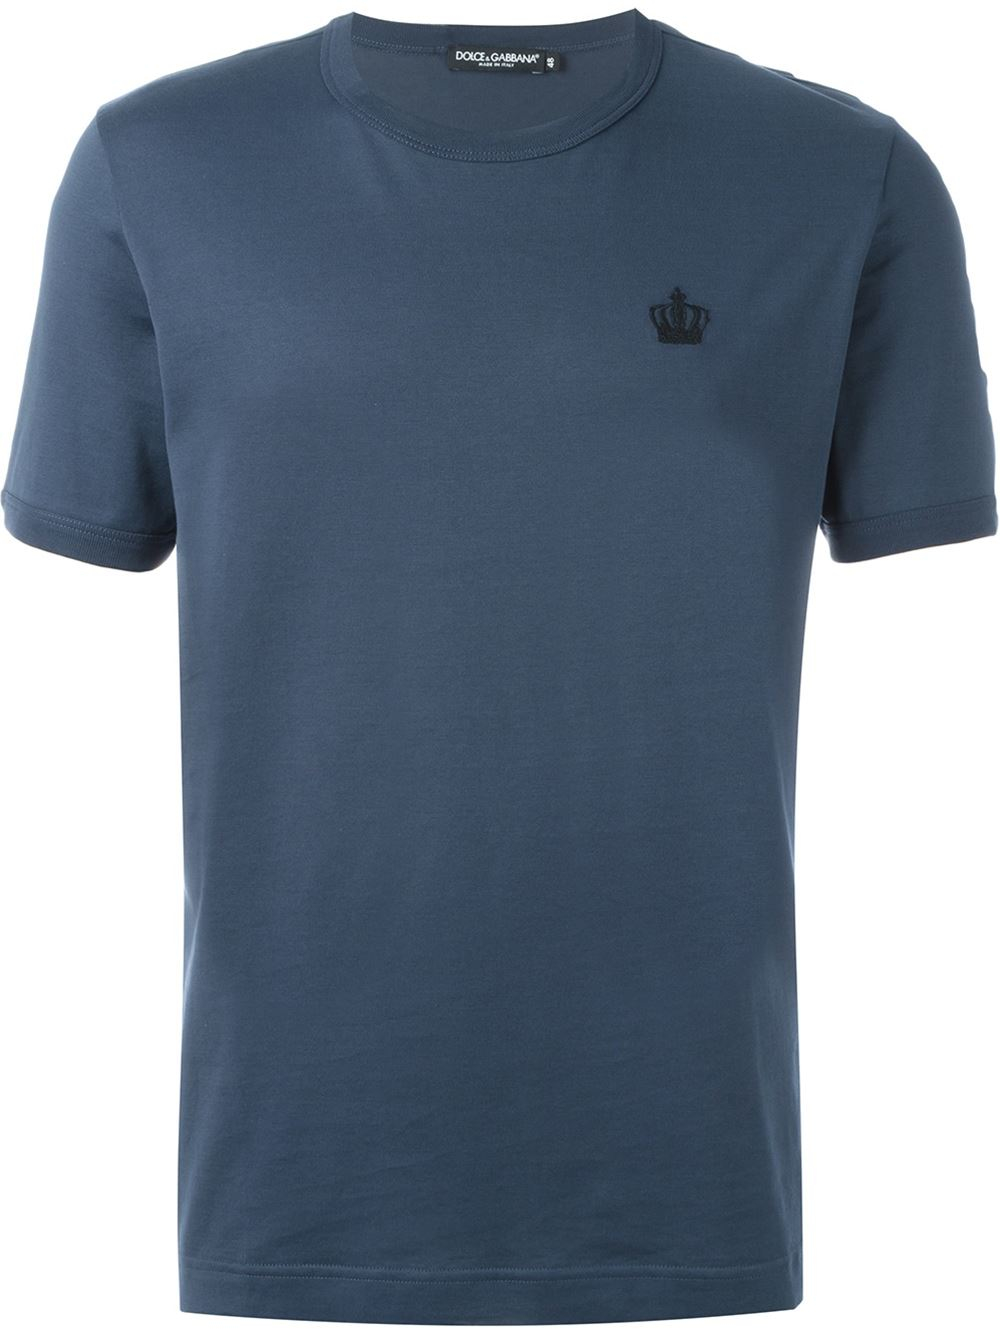 dolce gabbana embroidered crown t shirt in blue for men. Black Bedroom Furniture Sets. Home Design Ideas